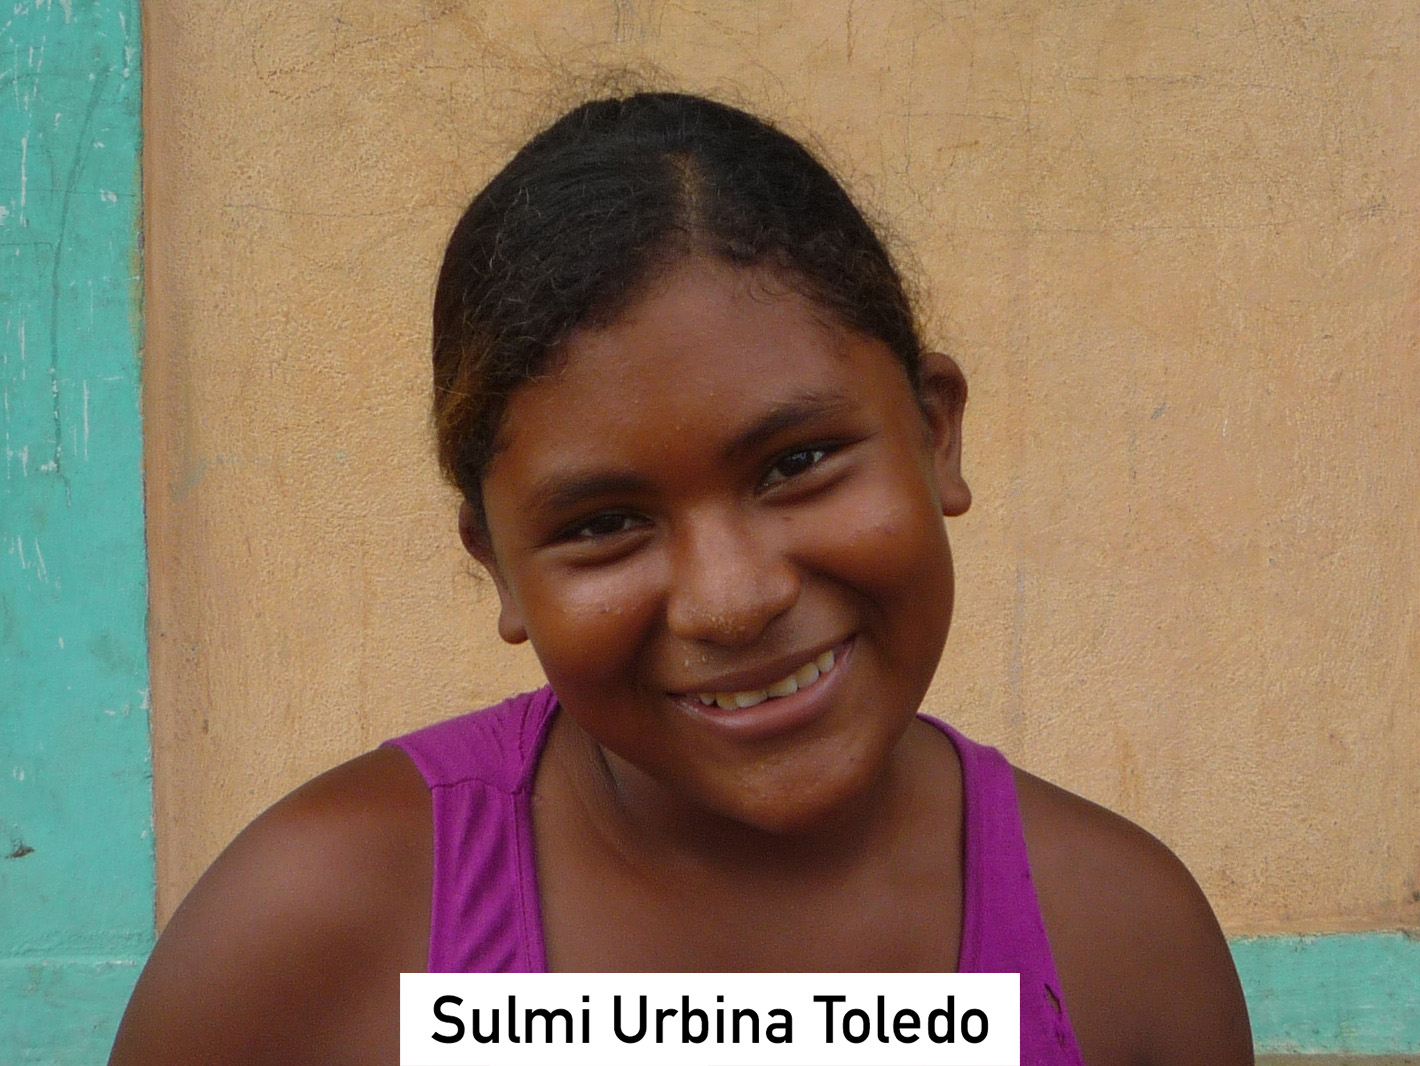 004 - Sulmi Urbina Toledo.jpg